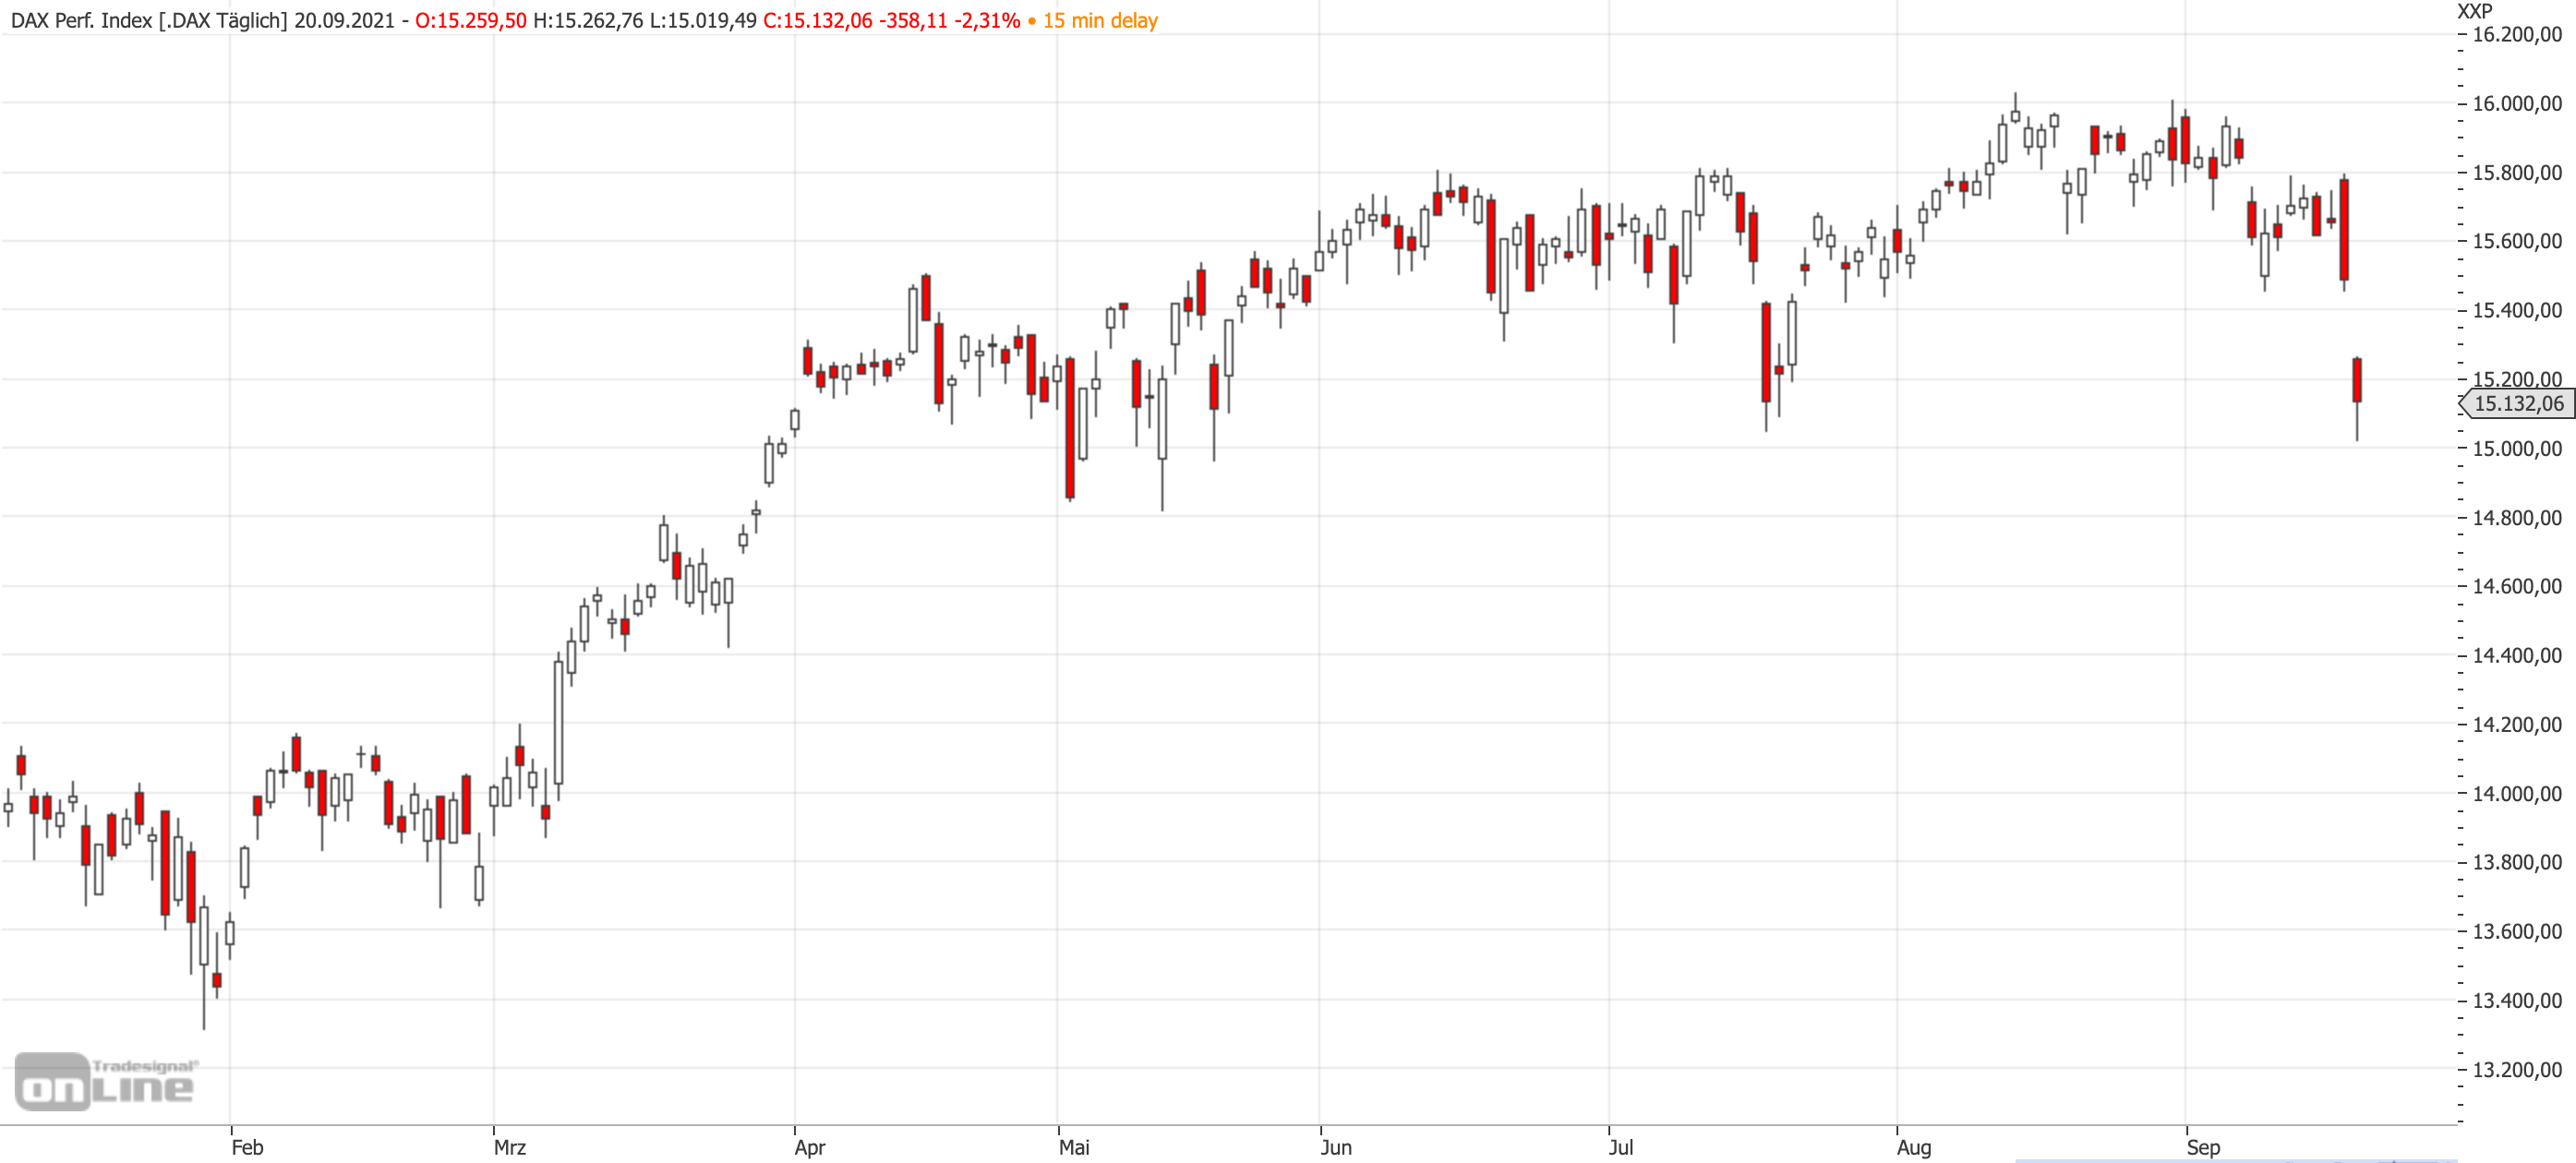 Mittelfristiger DAX-Chart am 20.09.2021